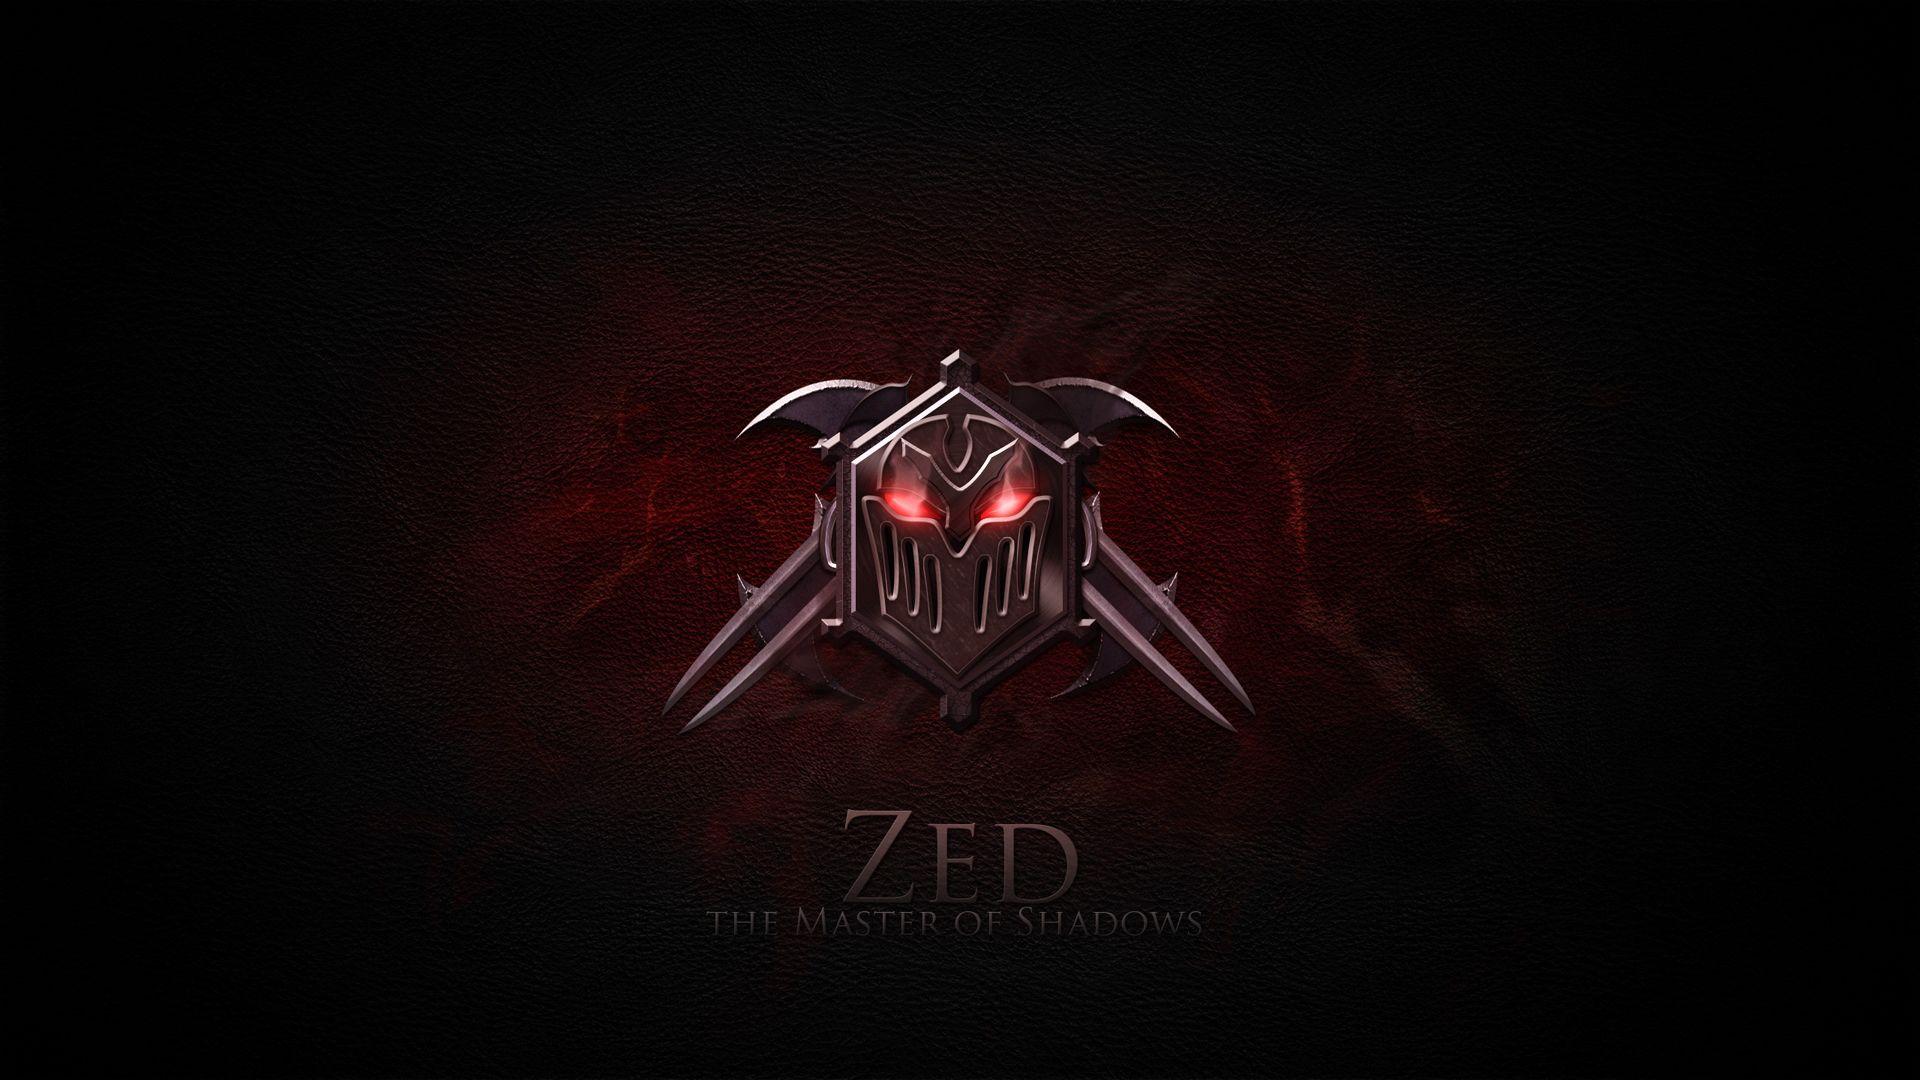 Symbol Zed LoL Pinterest Symbols